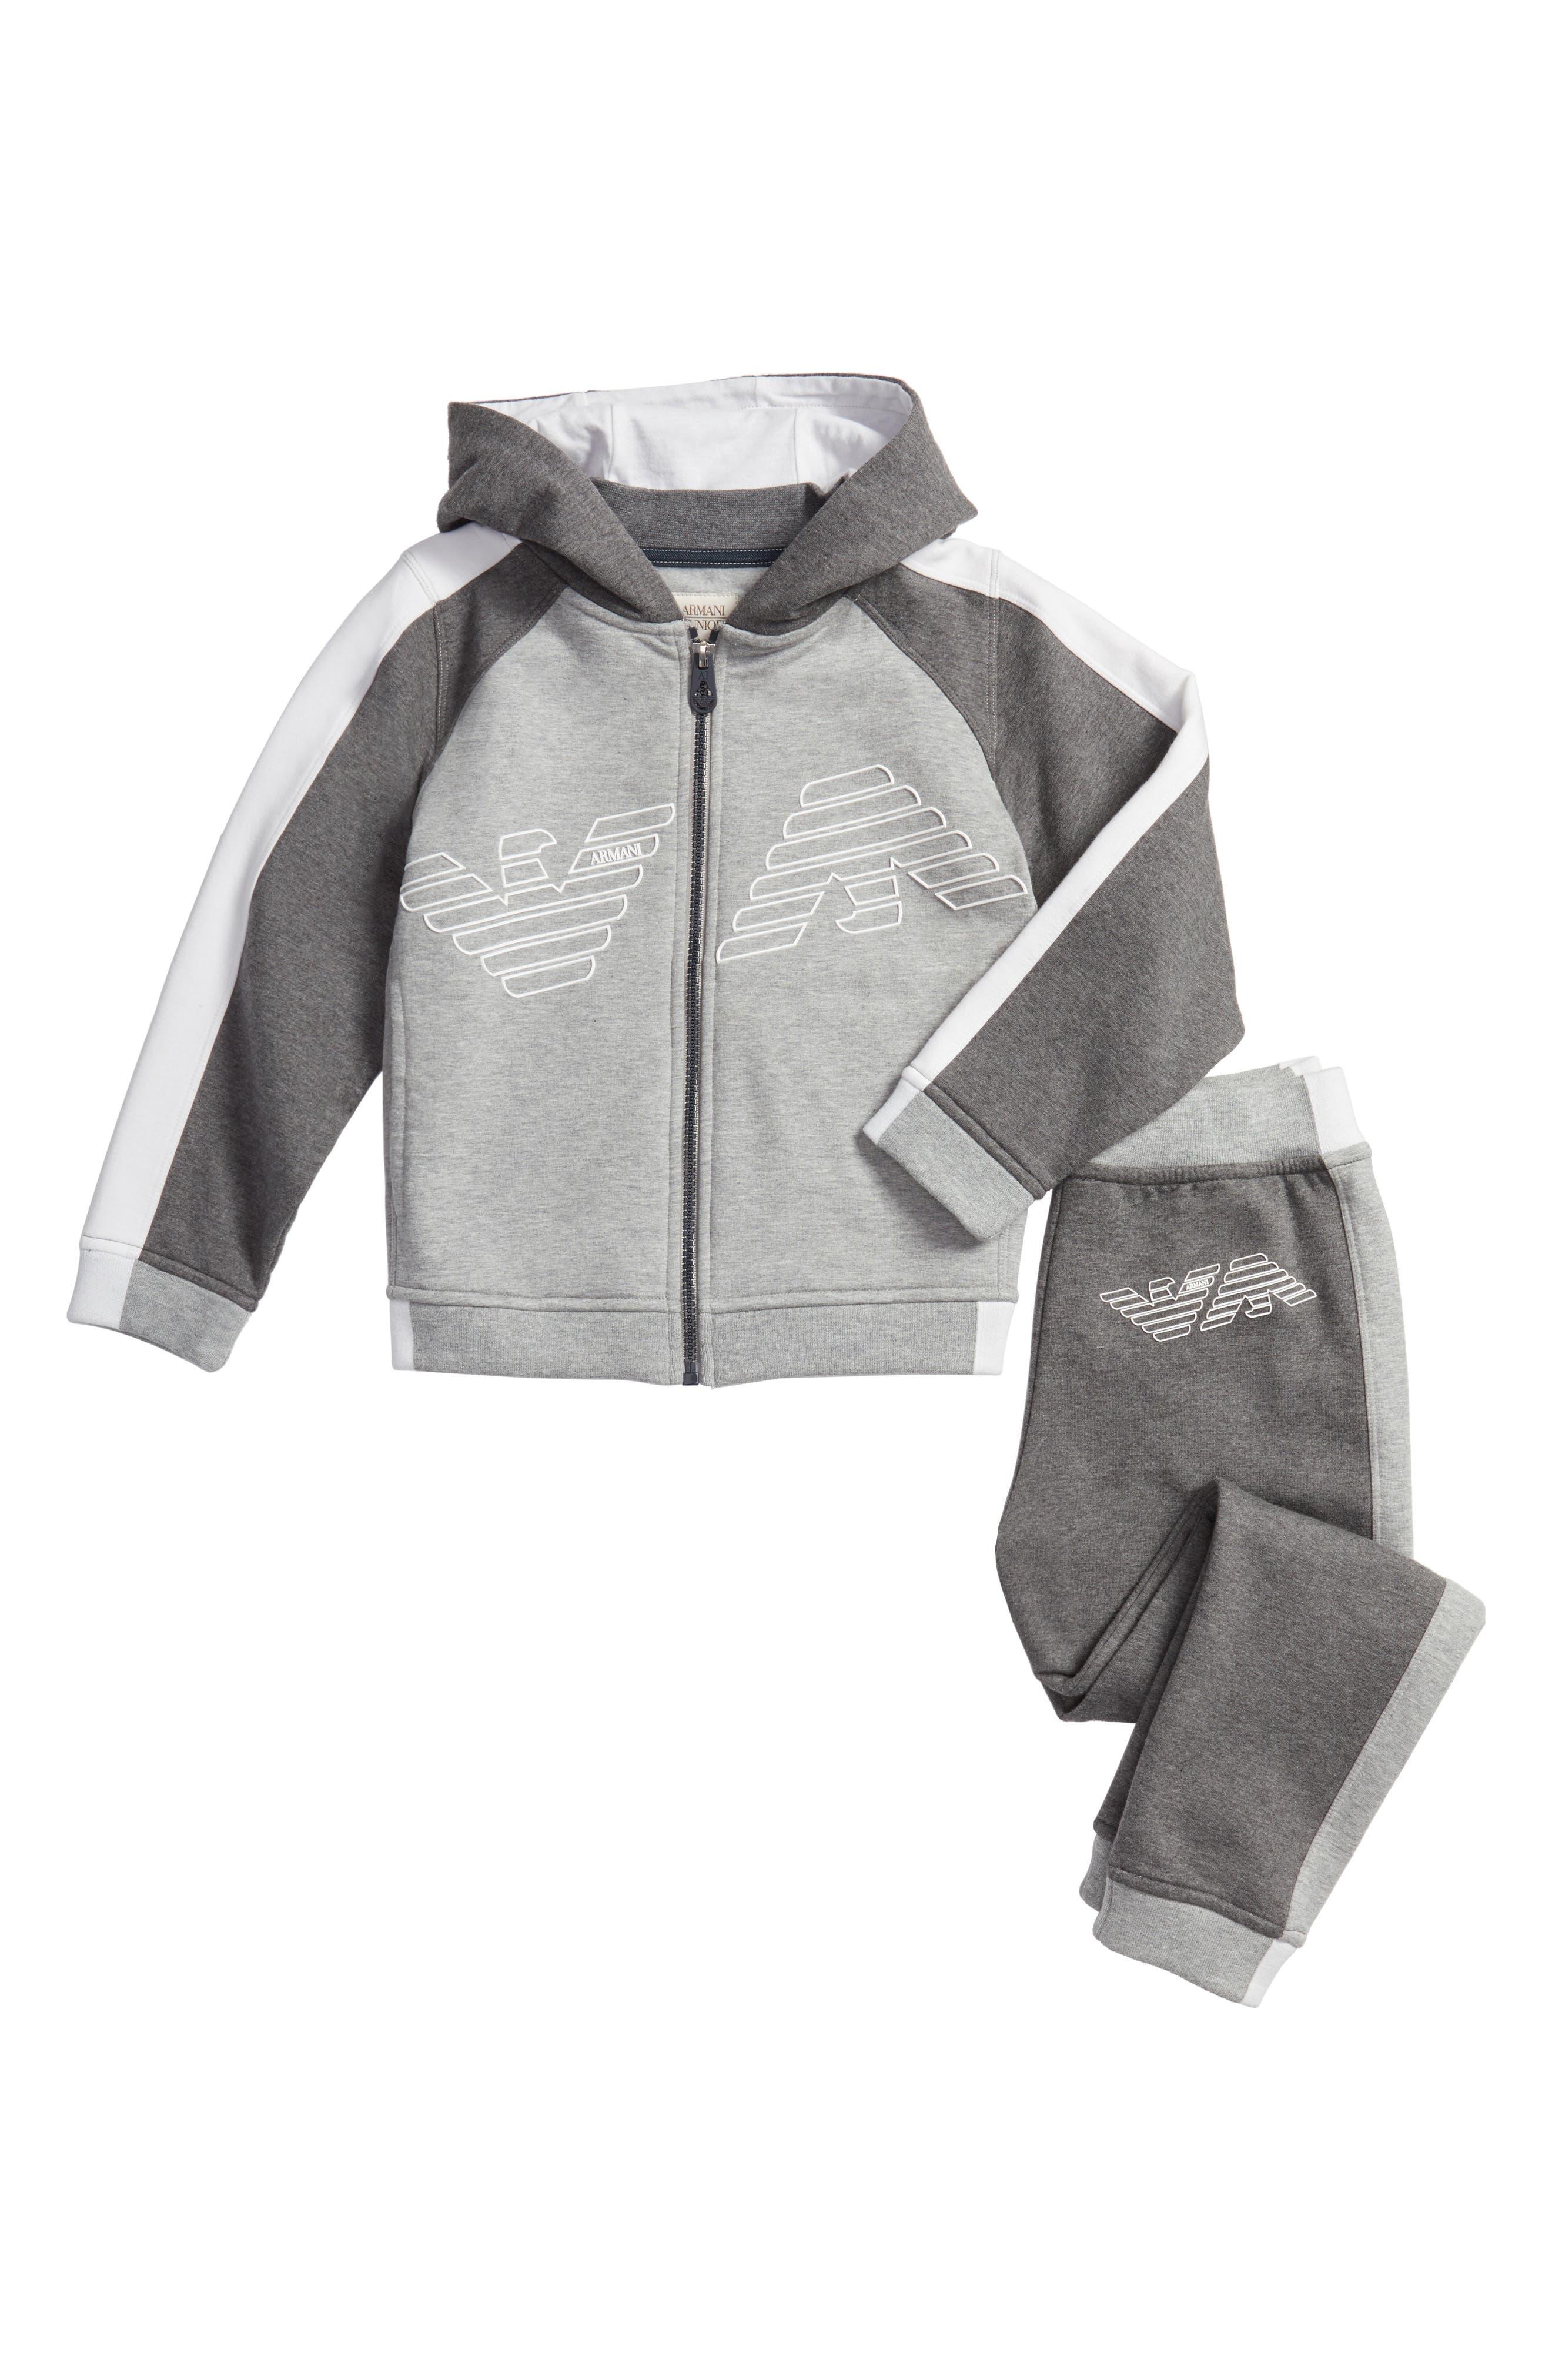 Main Image - Armani Junior Hooded Jacket & Sweatpants Set (Little Boys & Big Boys)